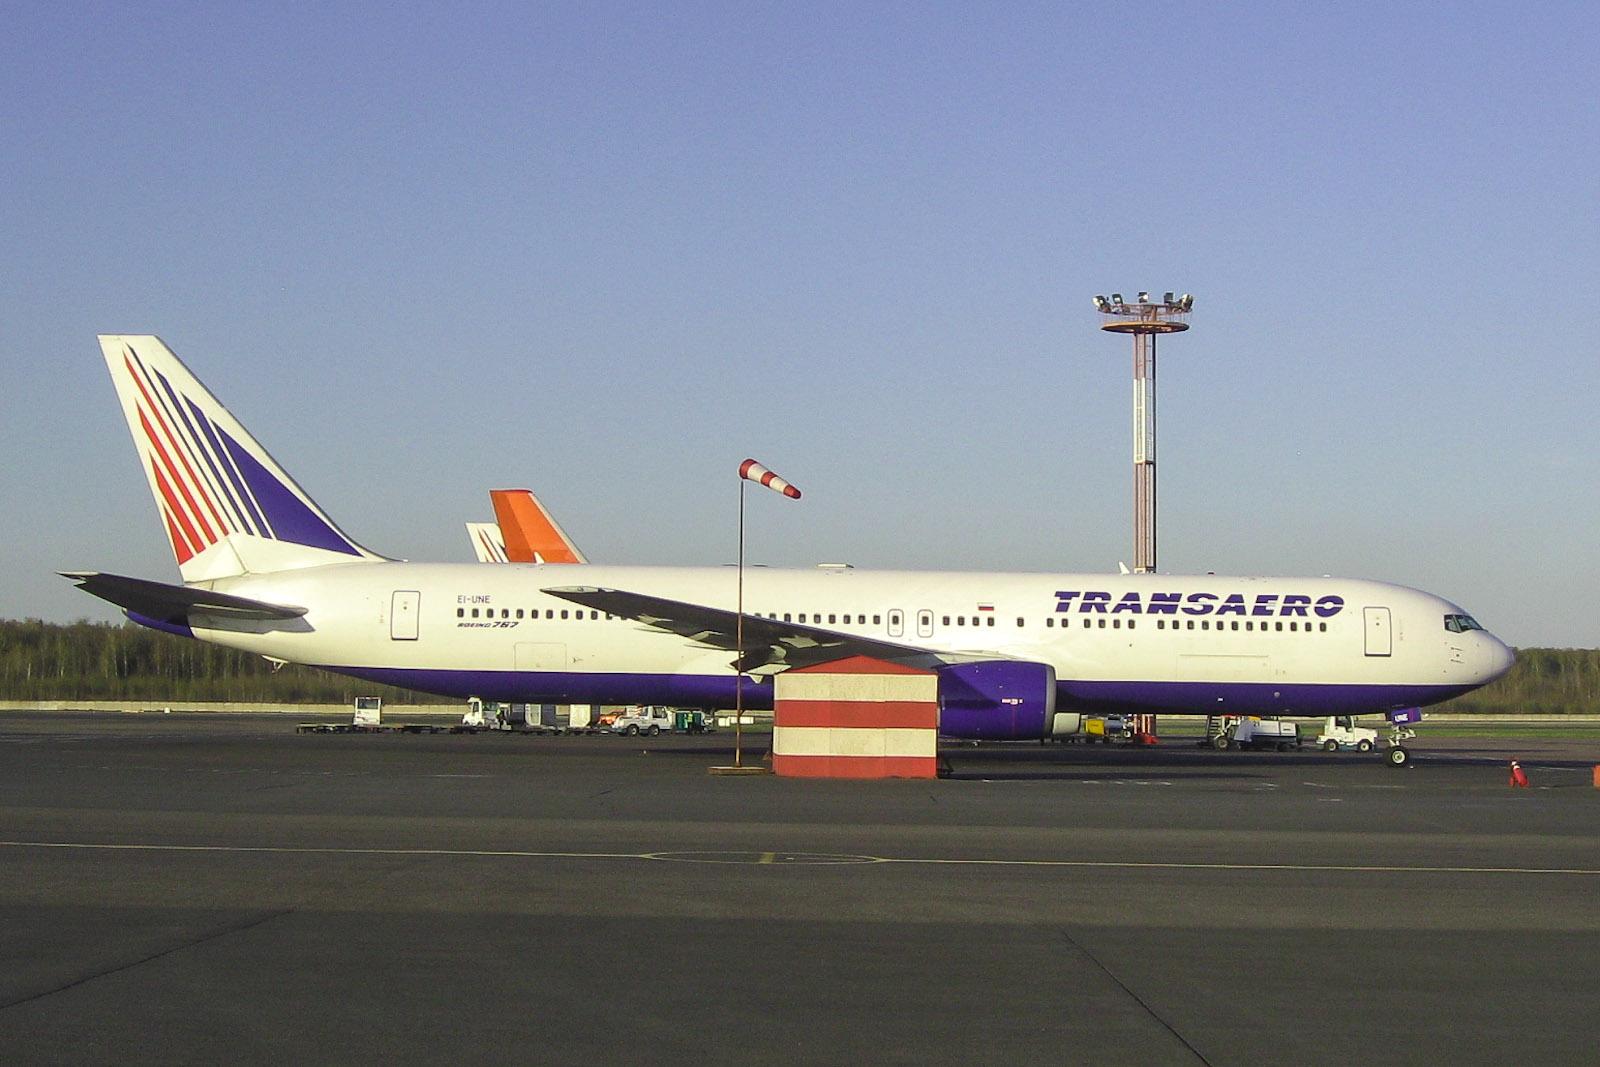 Boeing 767-300 EI-UNE авиакомпании Трансаэро  в аэропорту Домодедово